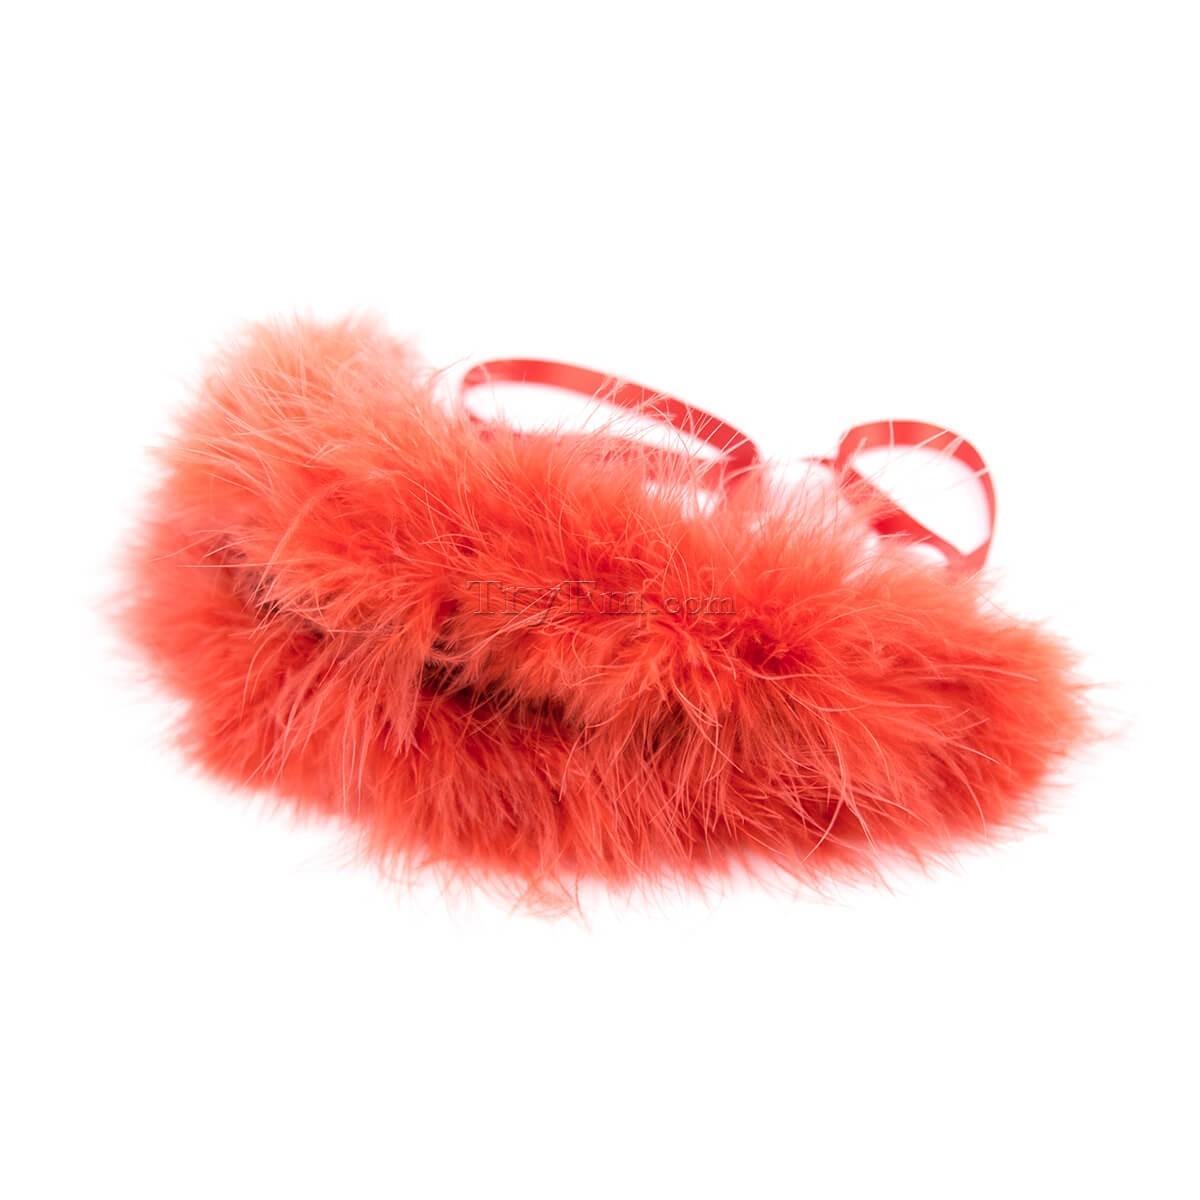 6-red-furry-blindfold9.jpg